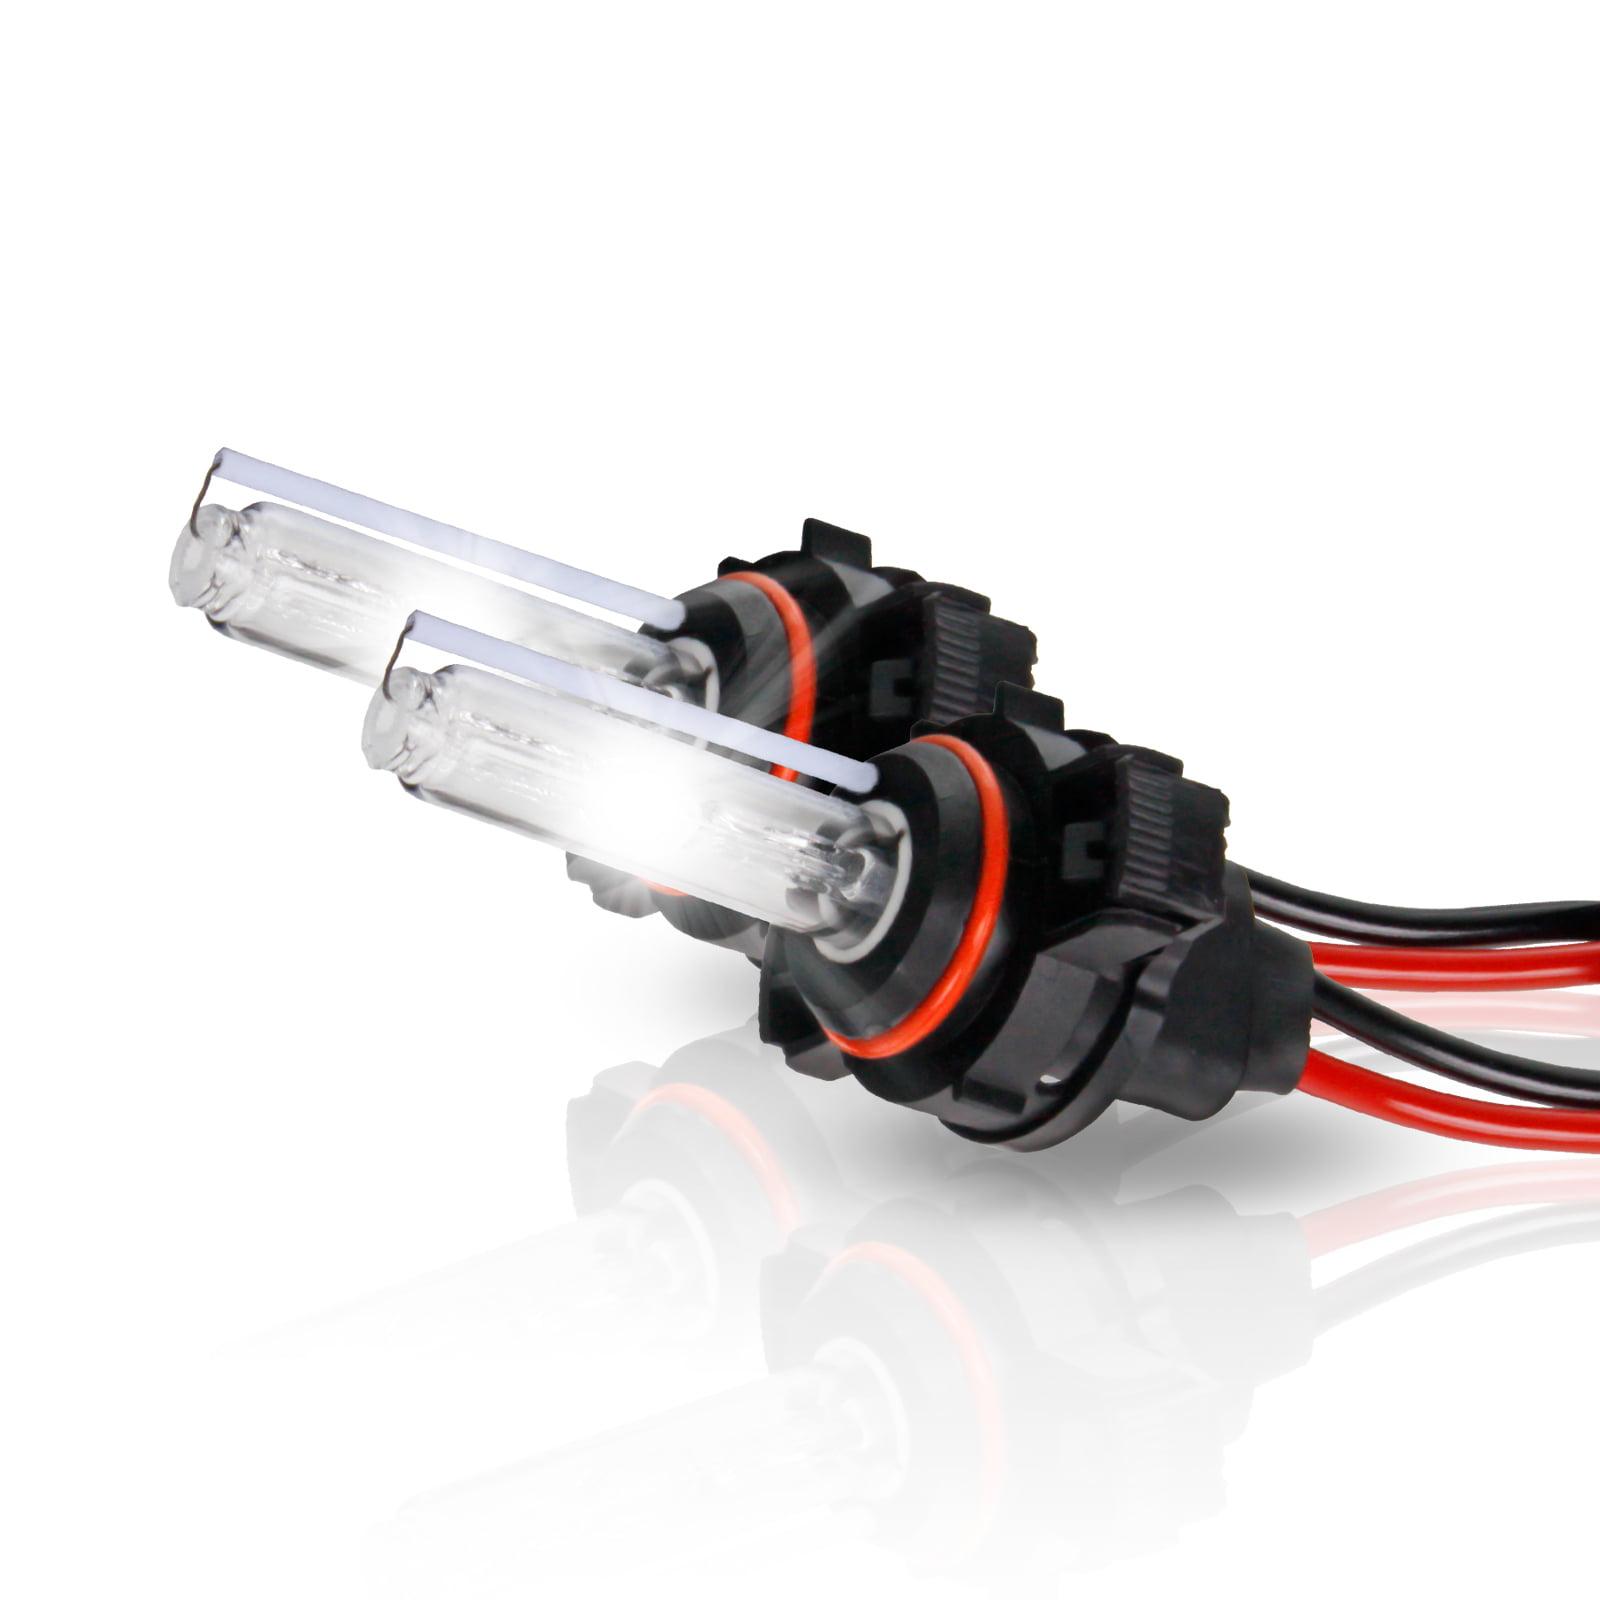 Project RA 35W 5202 8000K HID Blue Xenon Bulbs Fog Lights - HID Replacement Bulbs - Pair